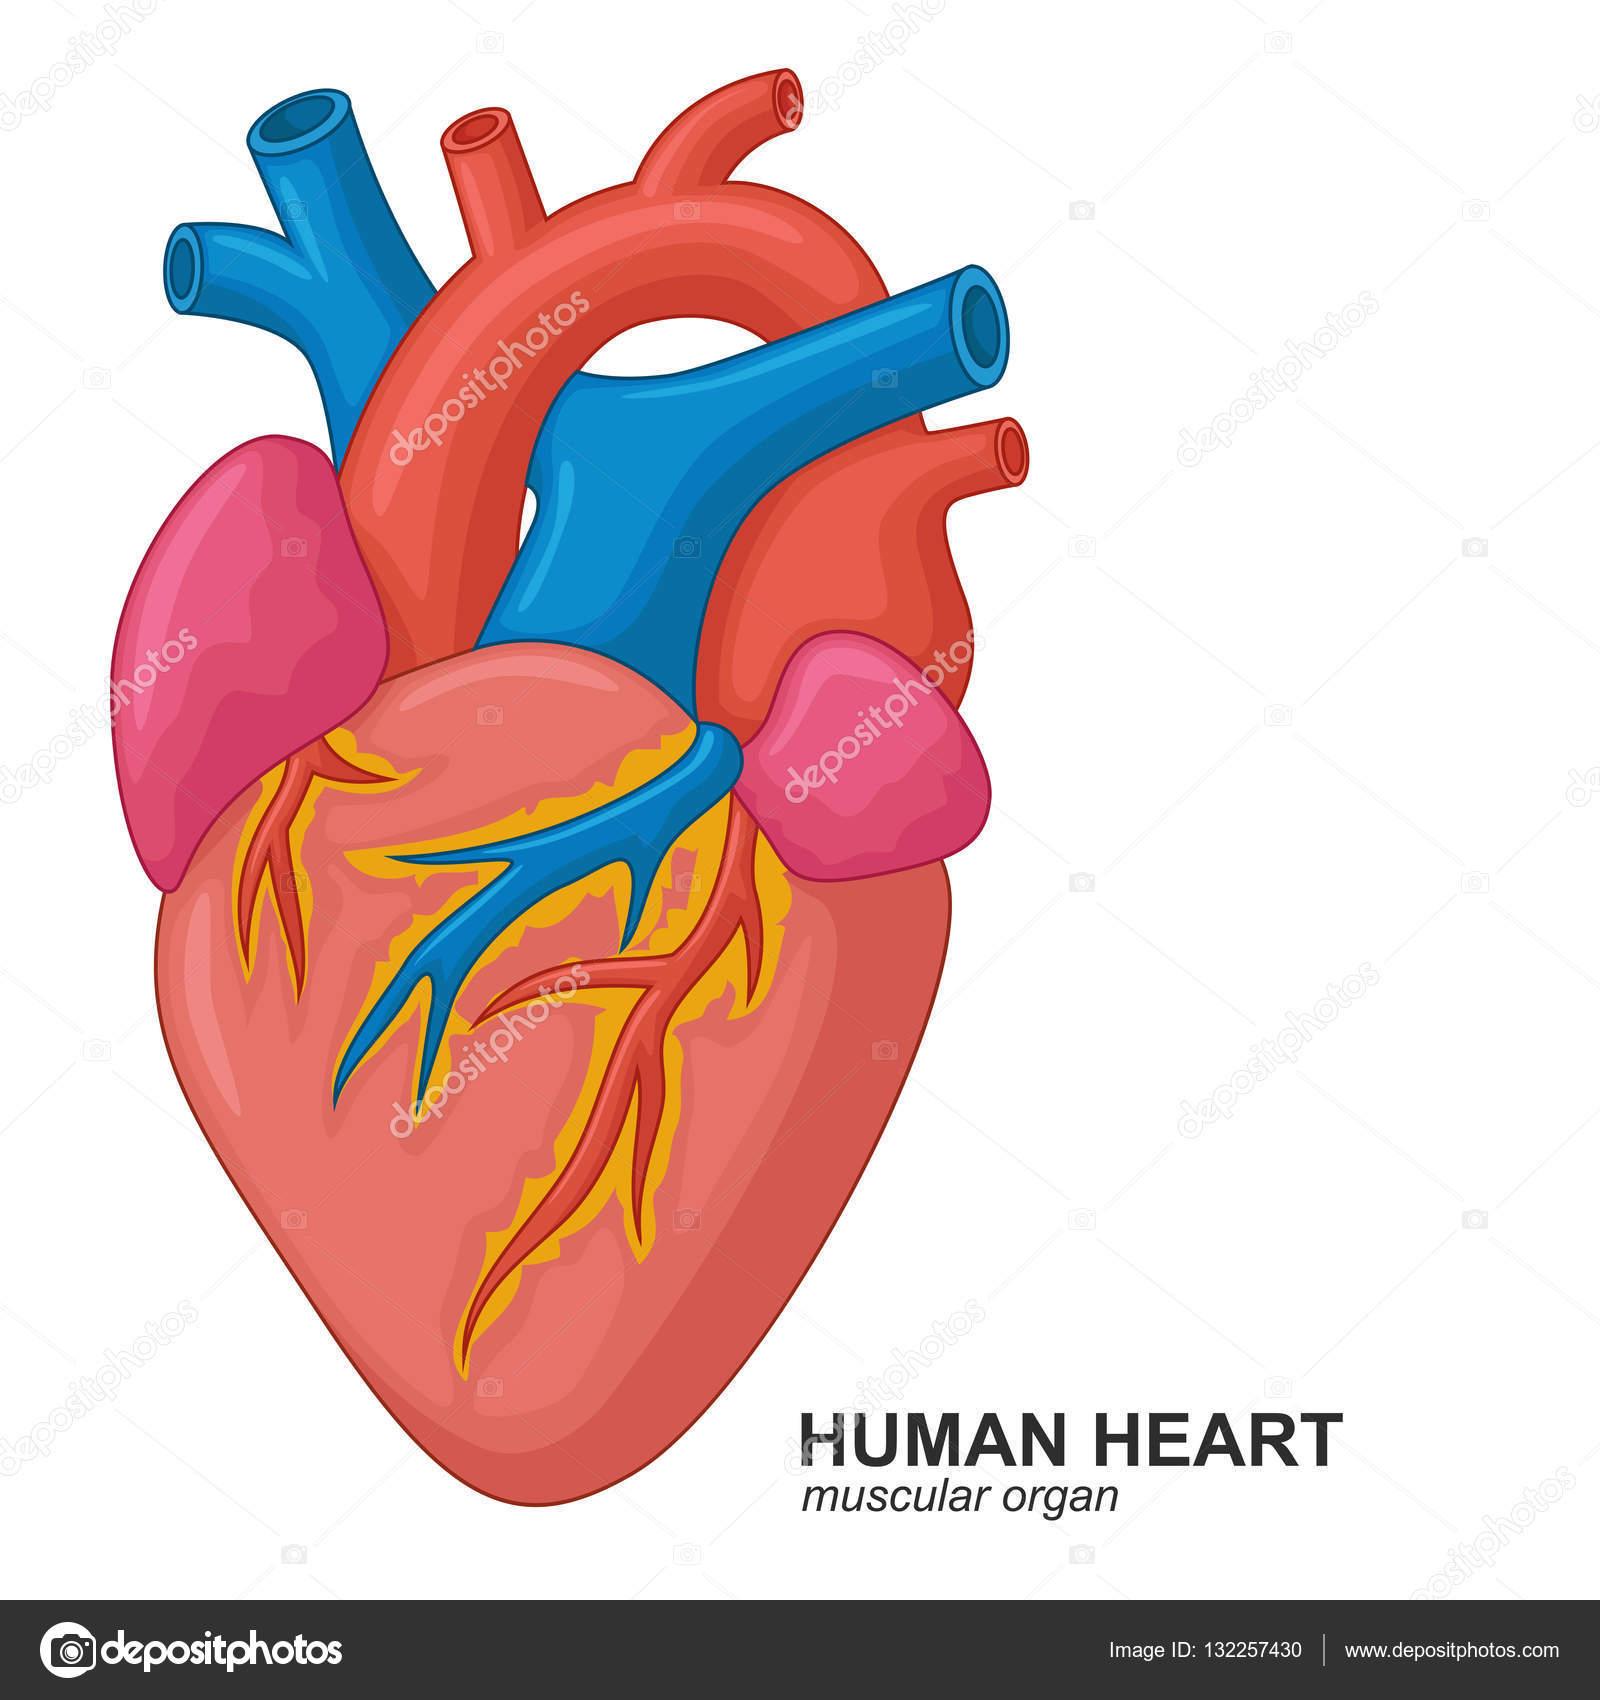 Dessin anim coeur humain image vectorielle fightingfear - Dessin coeur humain ...